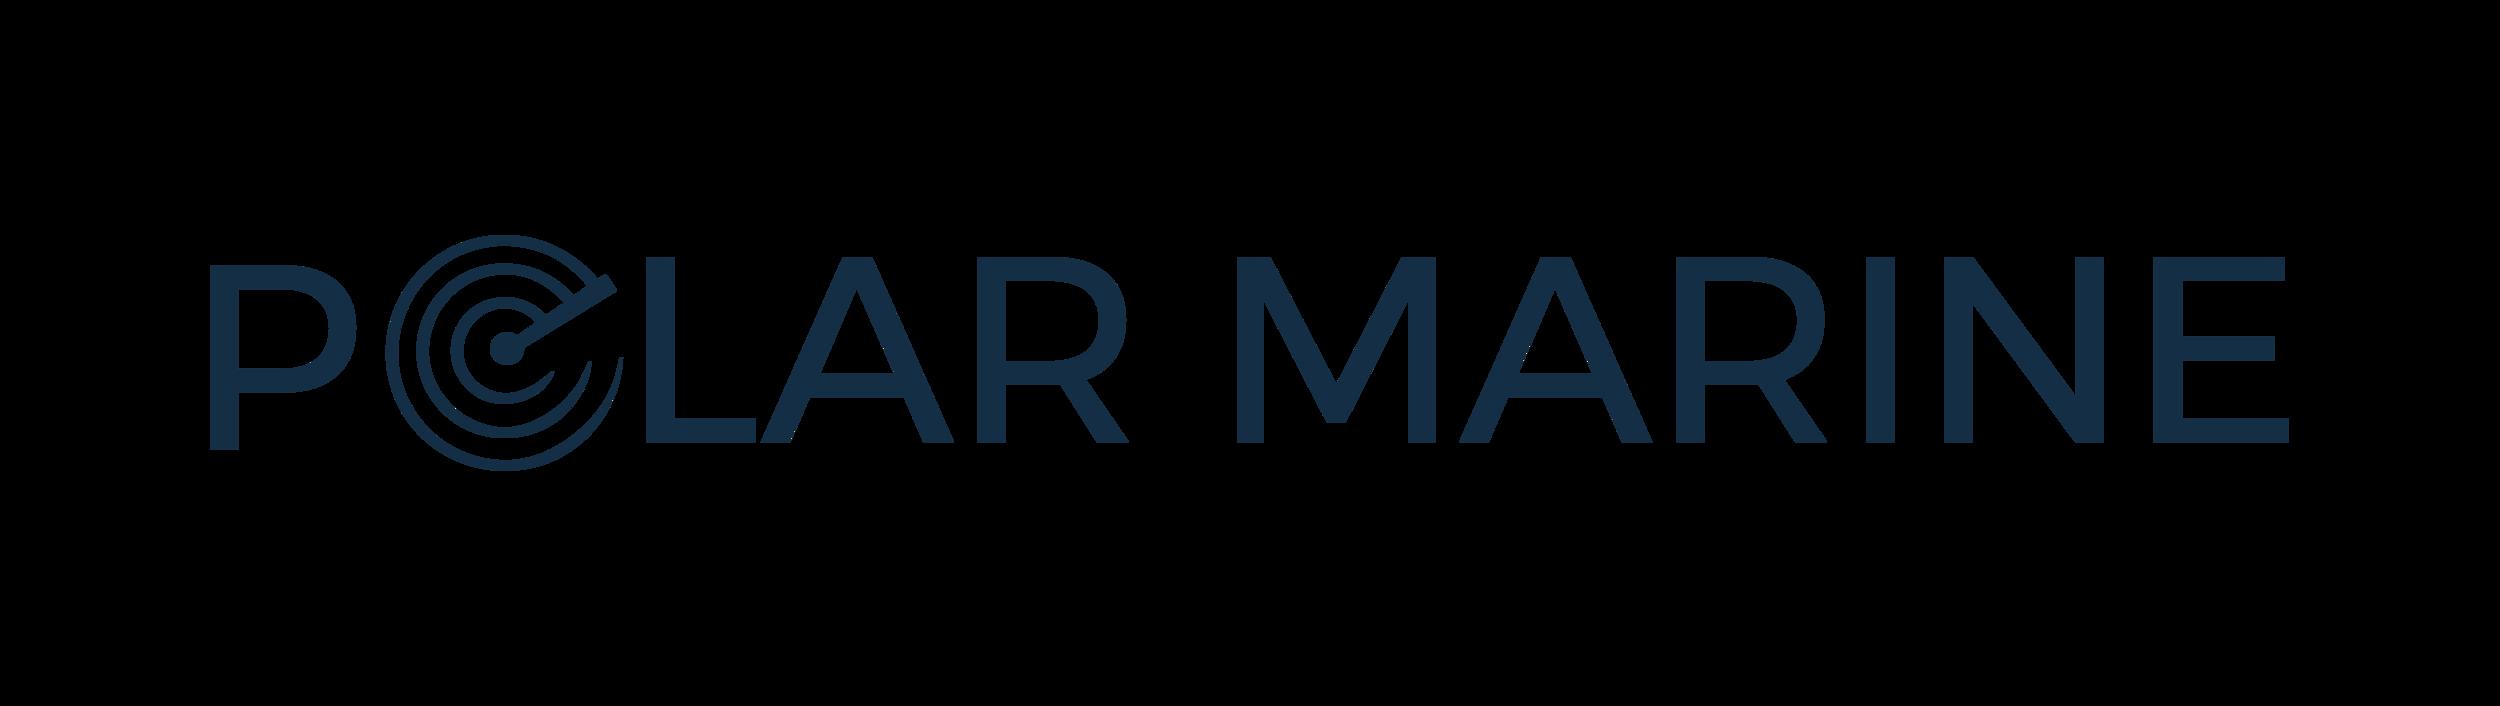 polarmarine-logo_5000.png